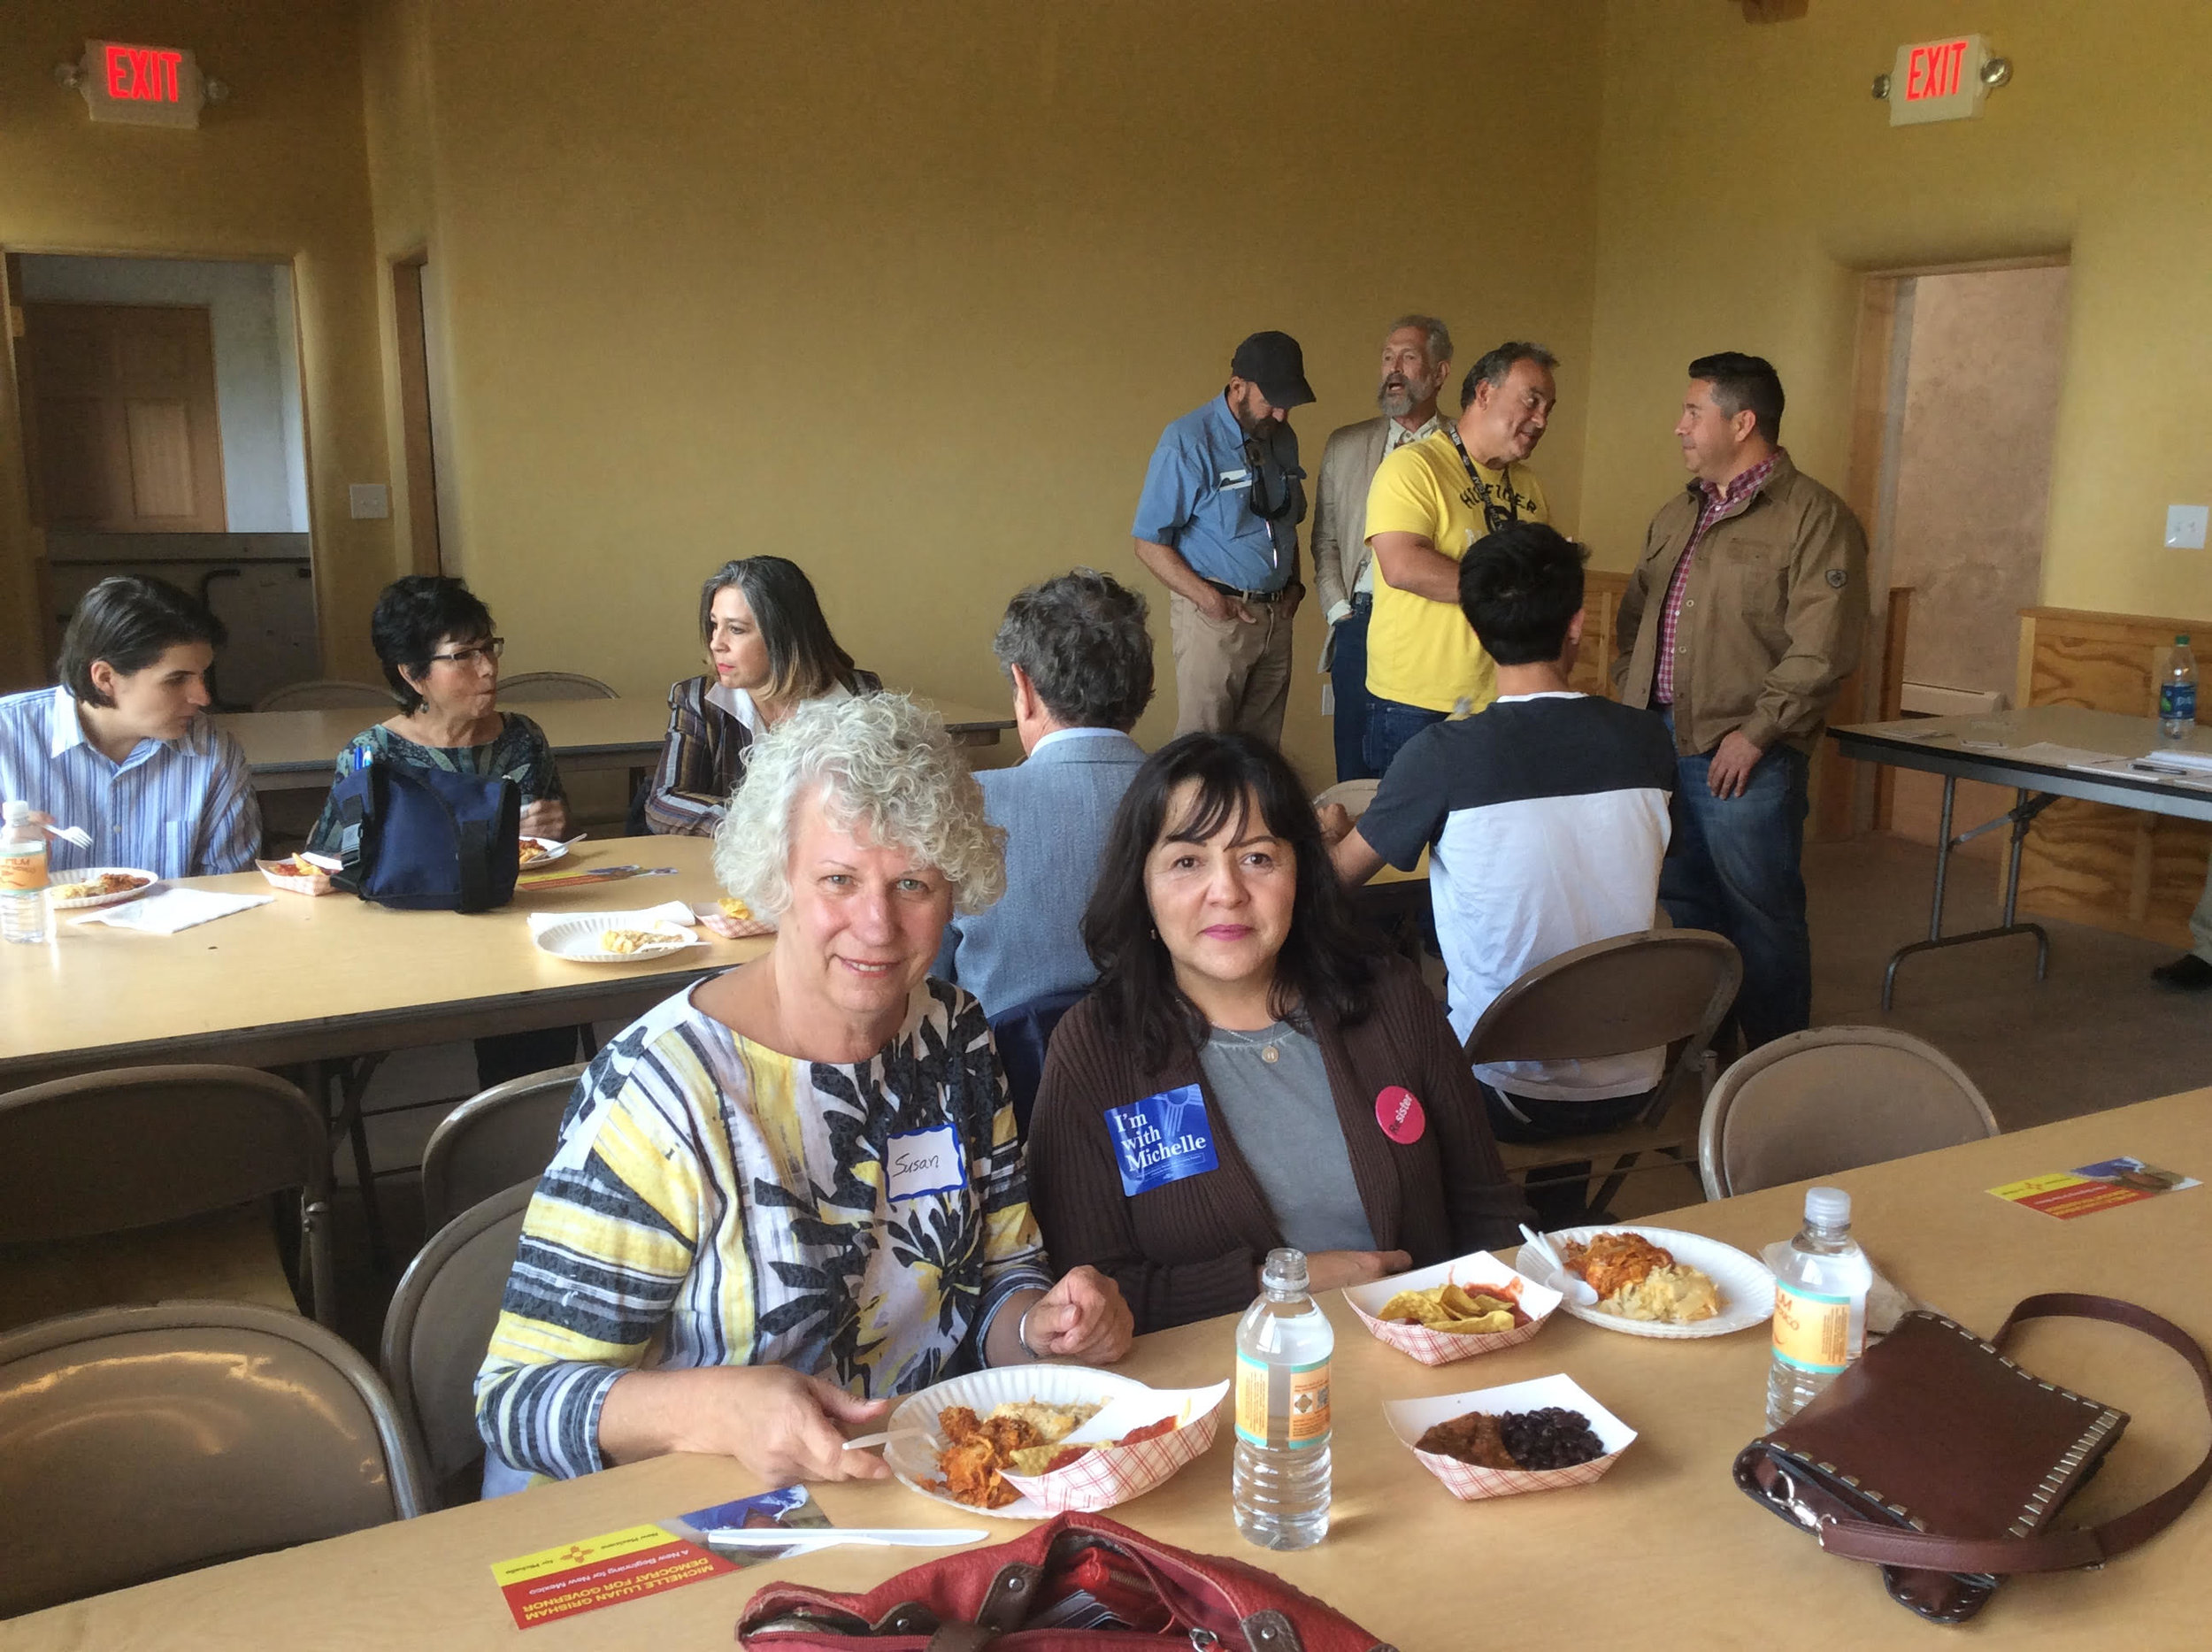 Attendee's, Santa Fe County Democratic Party Chairwoman Susan Popovich and San Miguel County Federation of Democratic Women President Noyola Padilla-Archibeque.